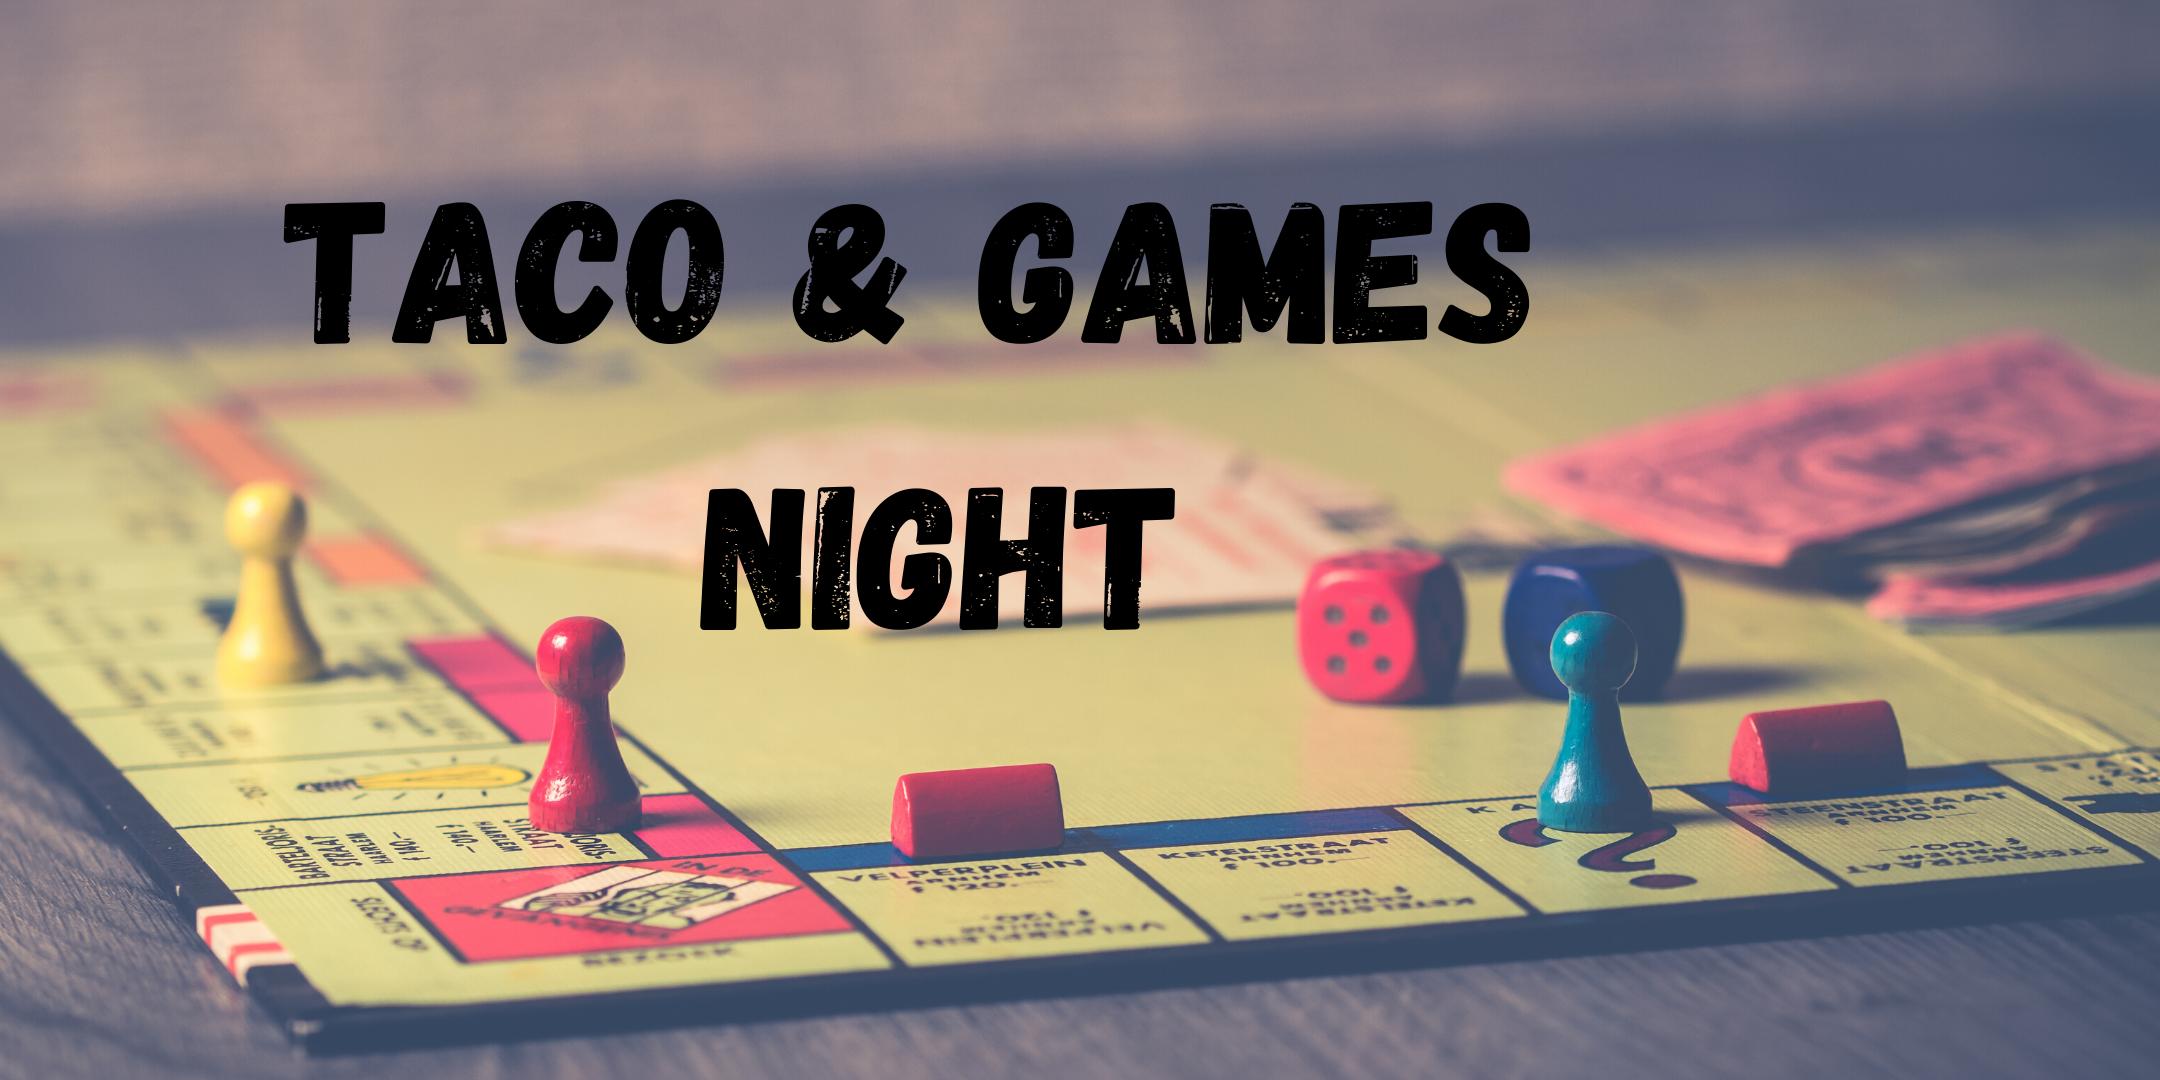 Taco & Games Night